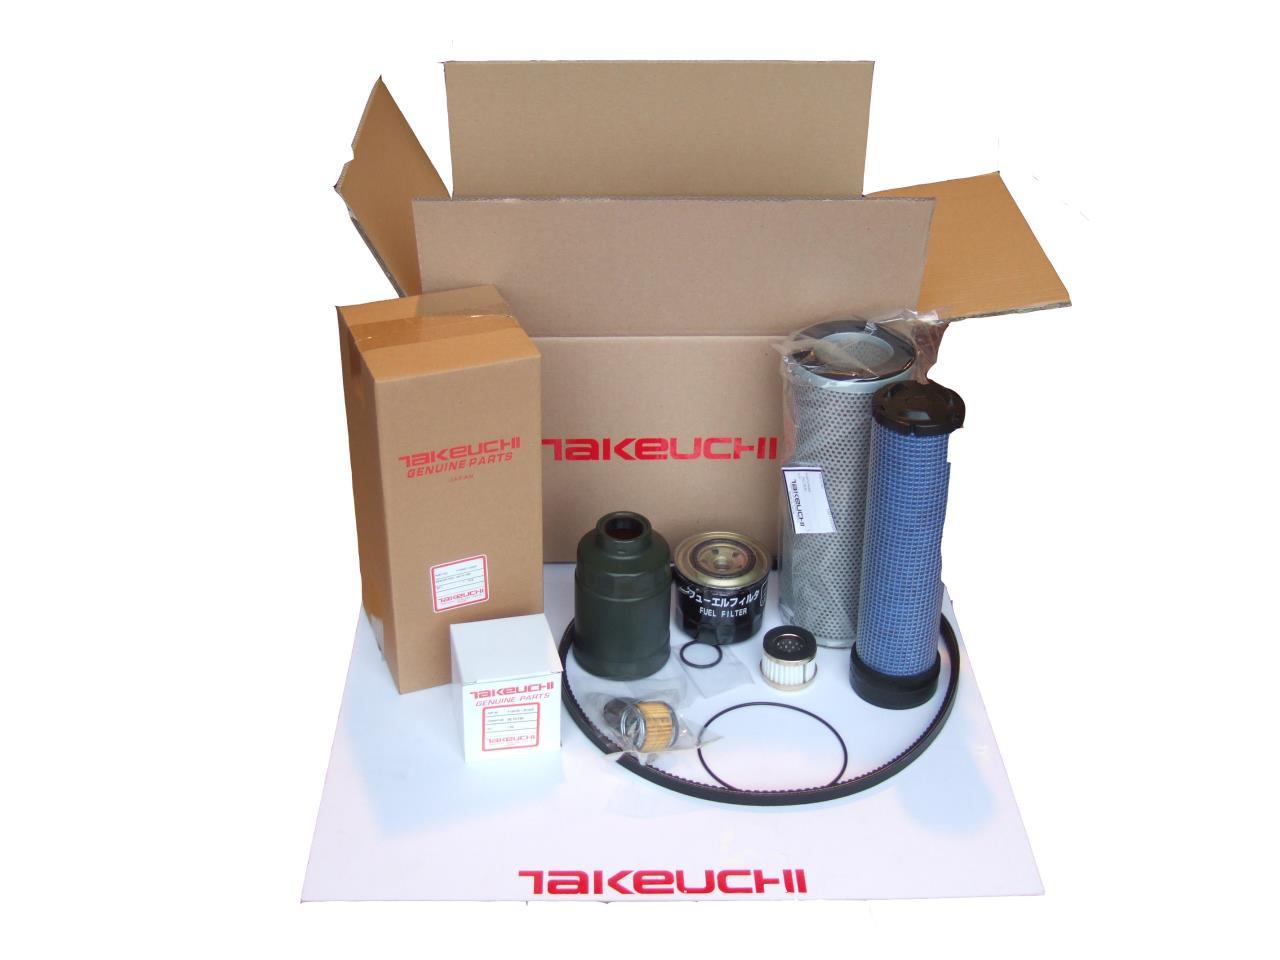 Takeuchi TB240 filtersæt